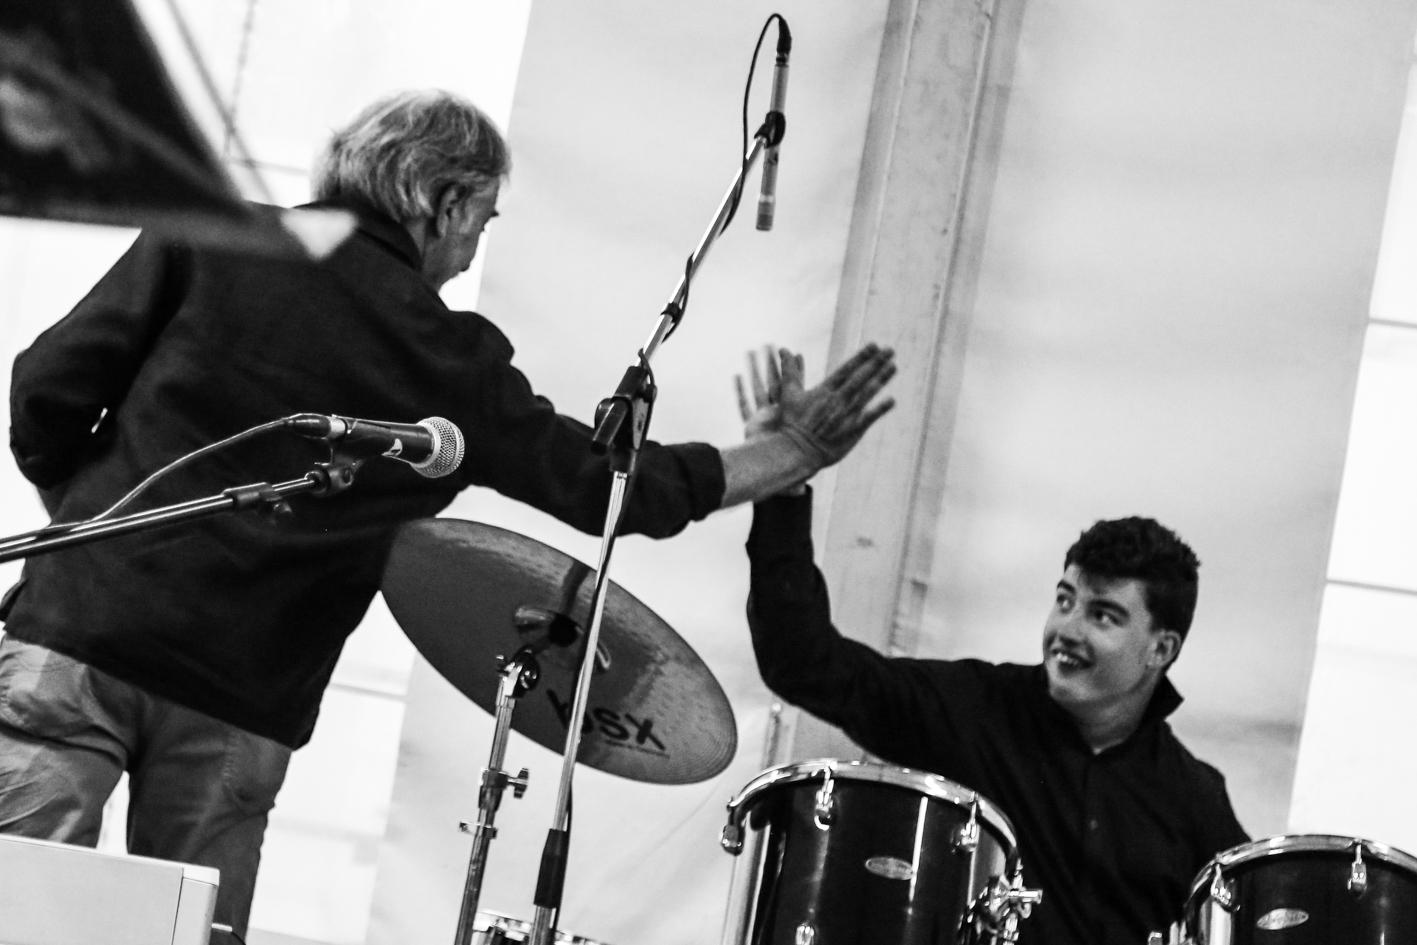 Calicando Band @ Sagra delle Raze 05_09_2016 (14)